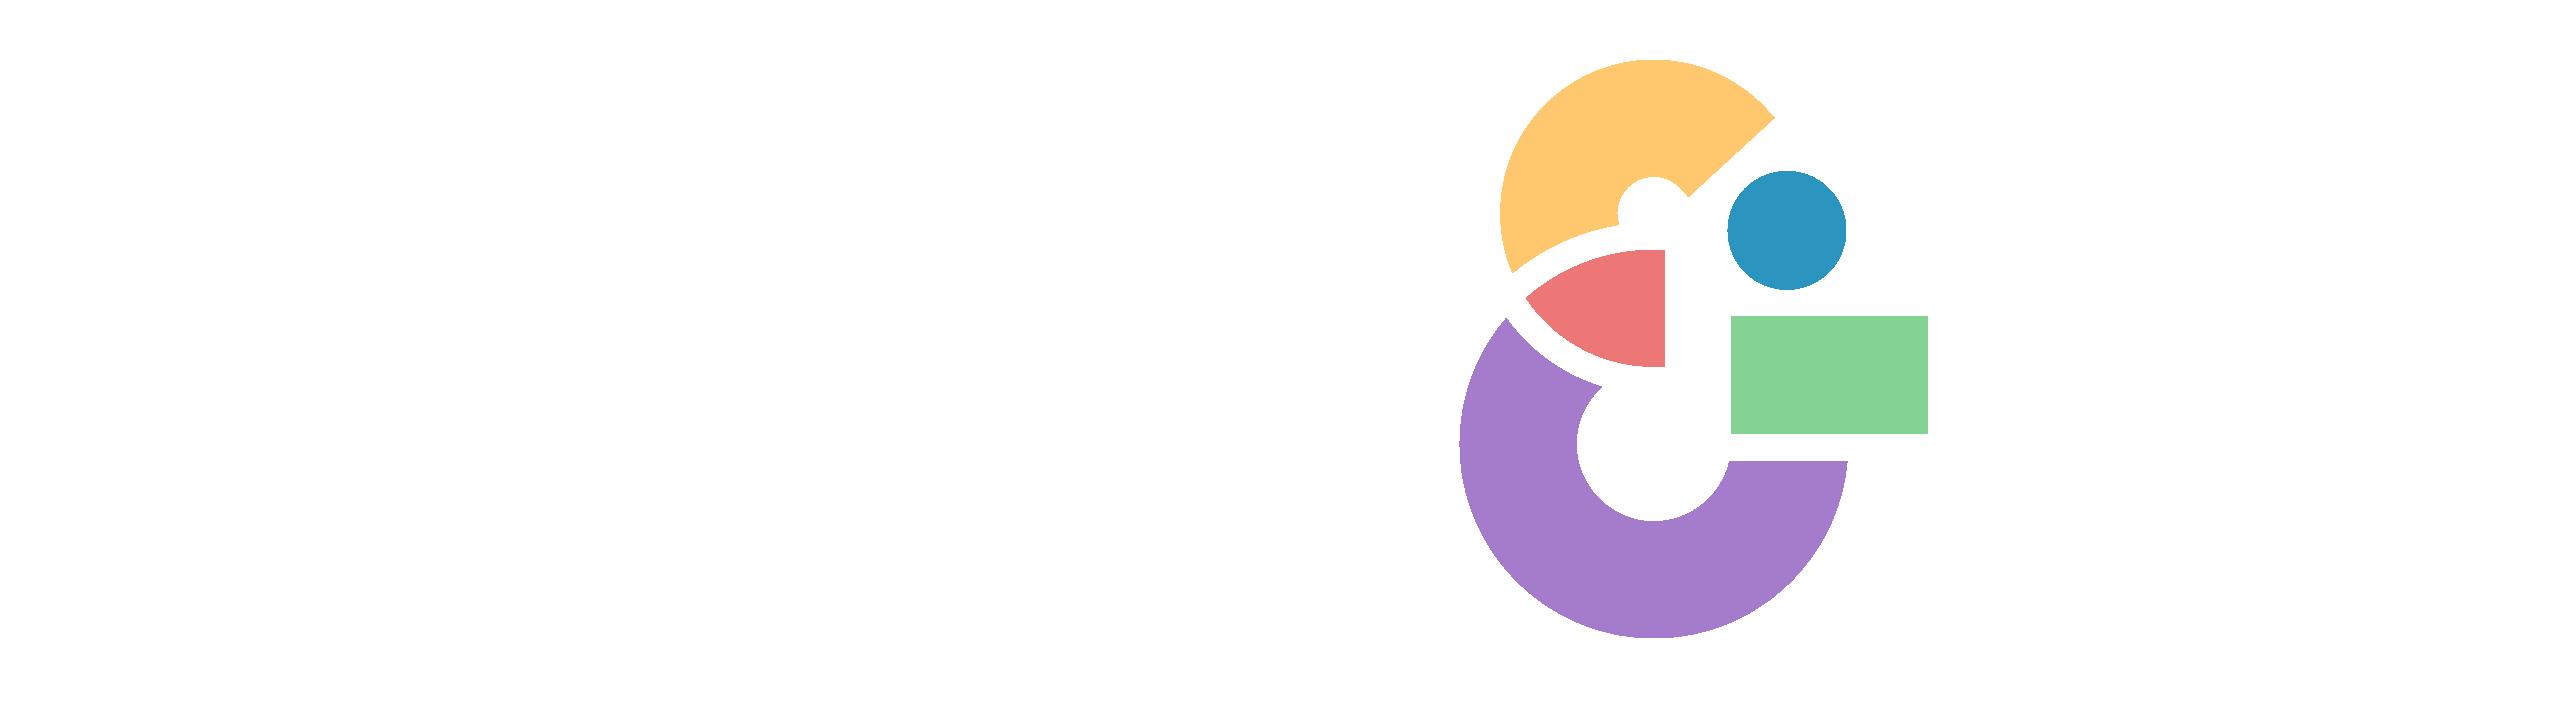 YMU group logo acidtest design